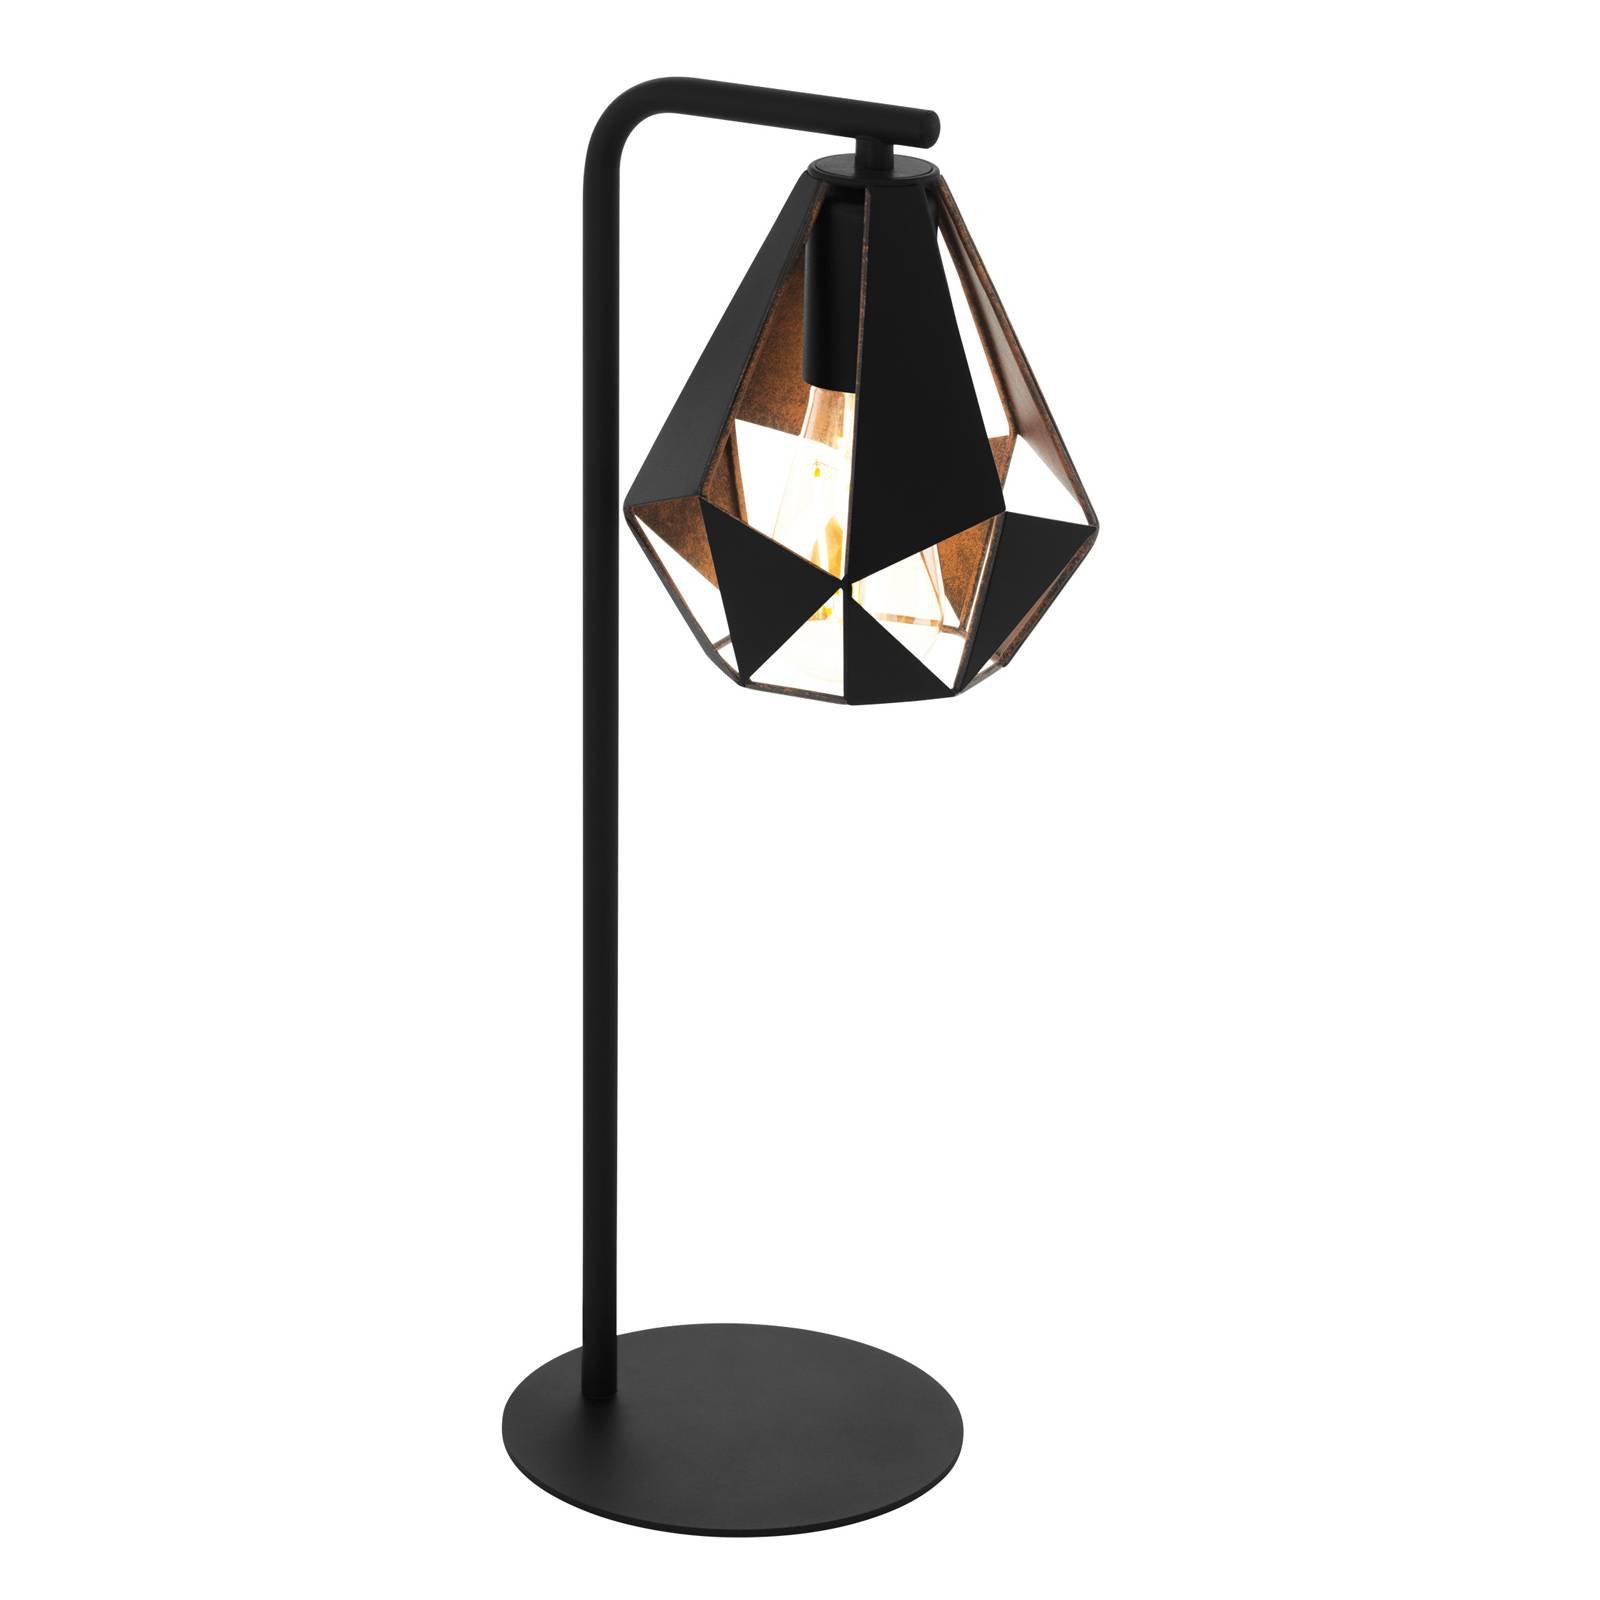 Bordlampe Carlton 4 i svart/kobber